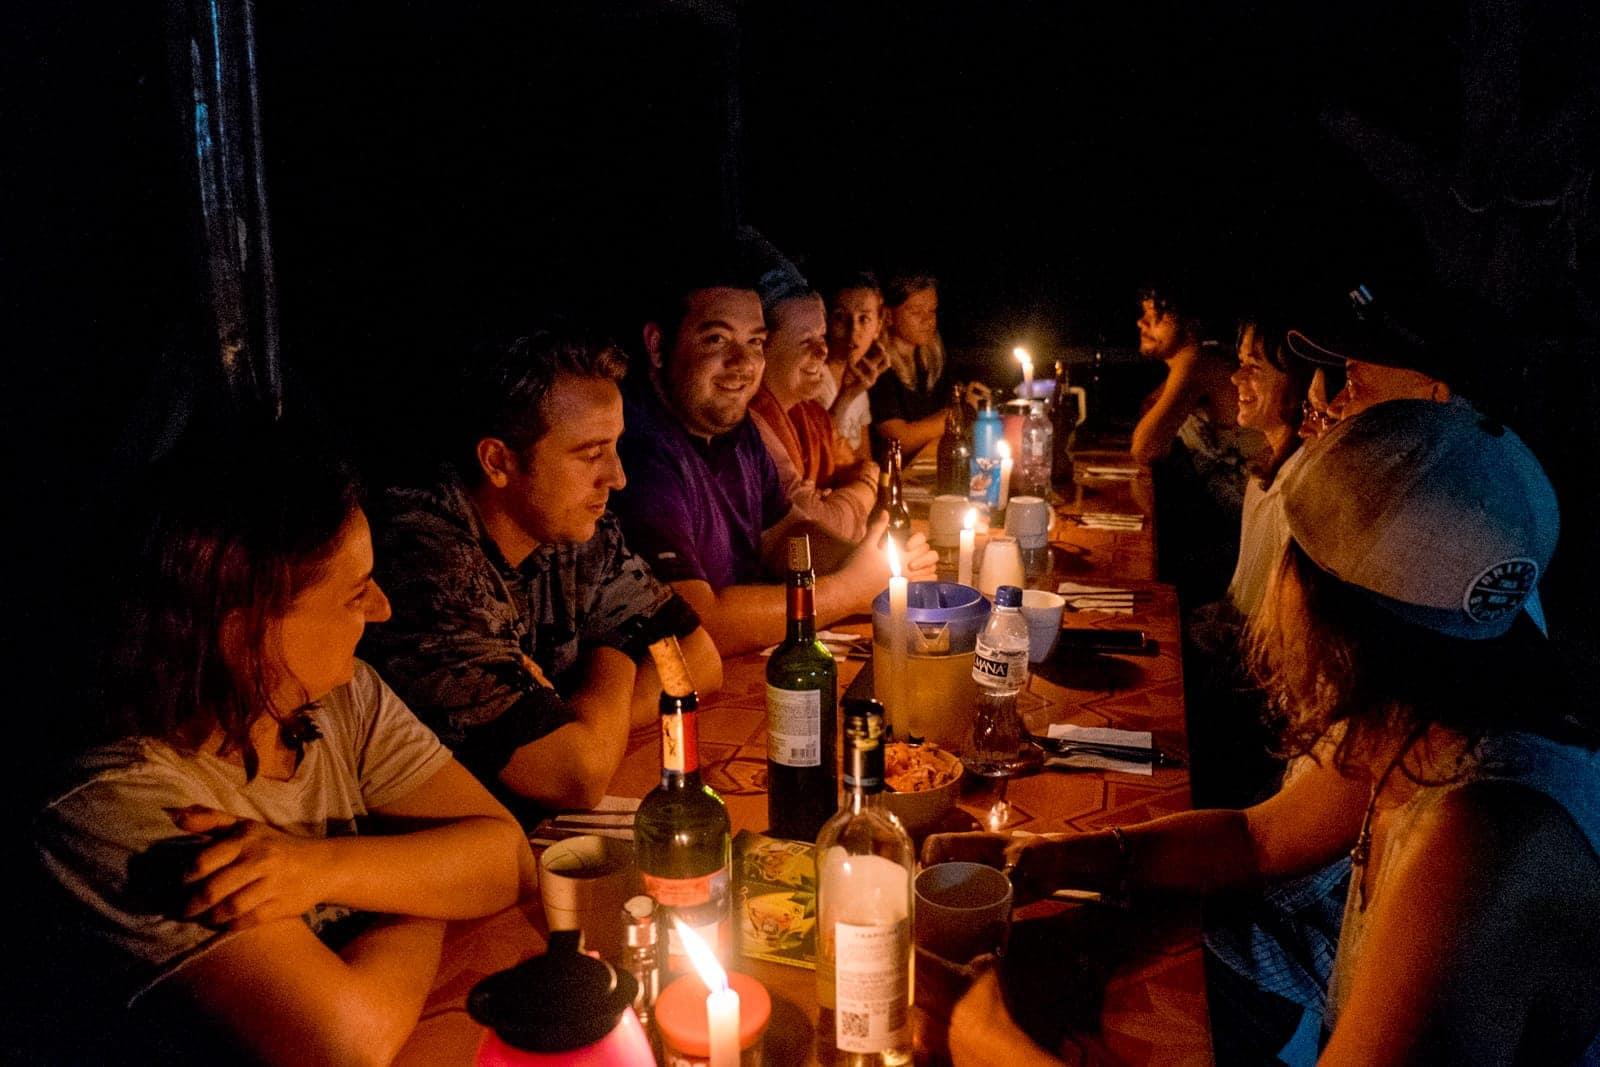 Un pequeño grupo de turistas en la selva amazónica amazónica [19659047] Habitación ecuatoriana en Ecuador Amazon